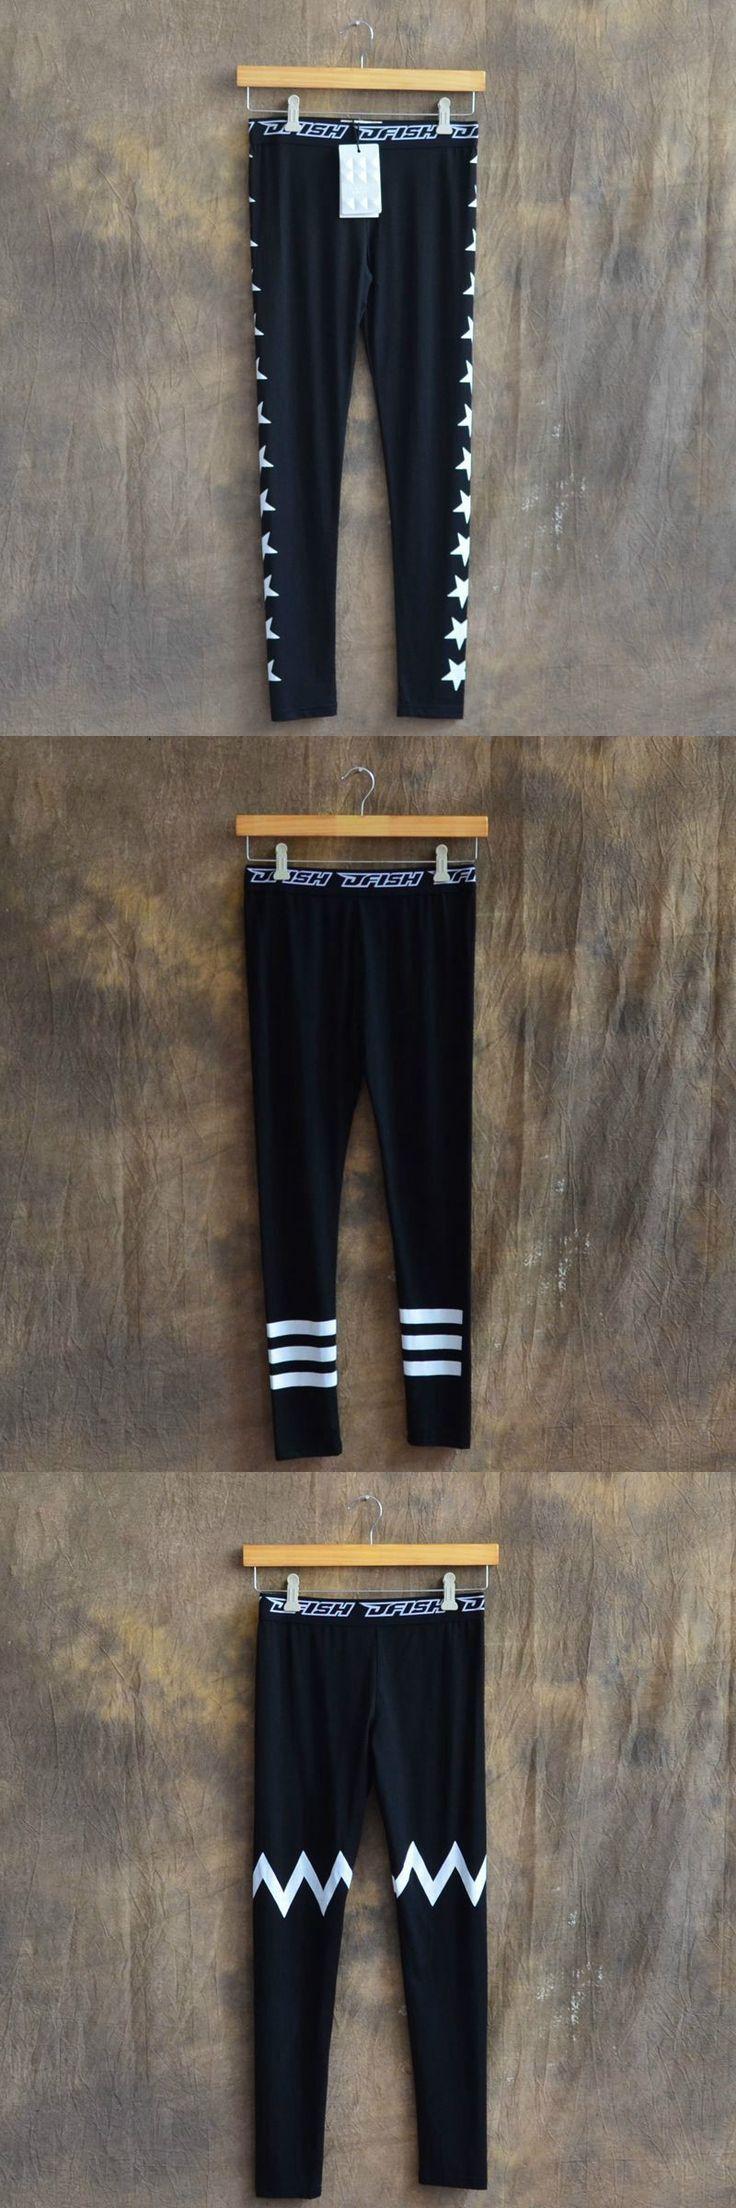 Harem Hip Hop Dance Pants Mens Jogger Pants Compression Tights Leggings Men Skinny Pants Mens Trousers Formal Sexy Mens Pants